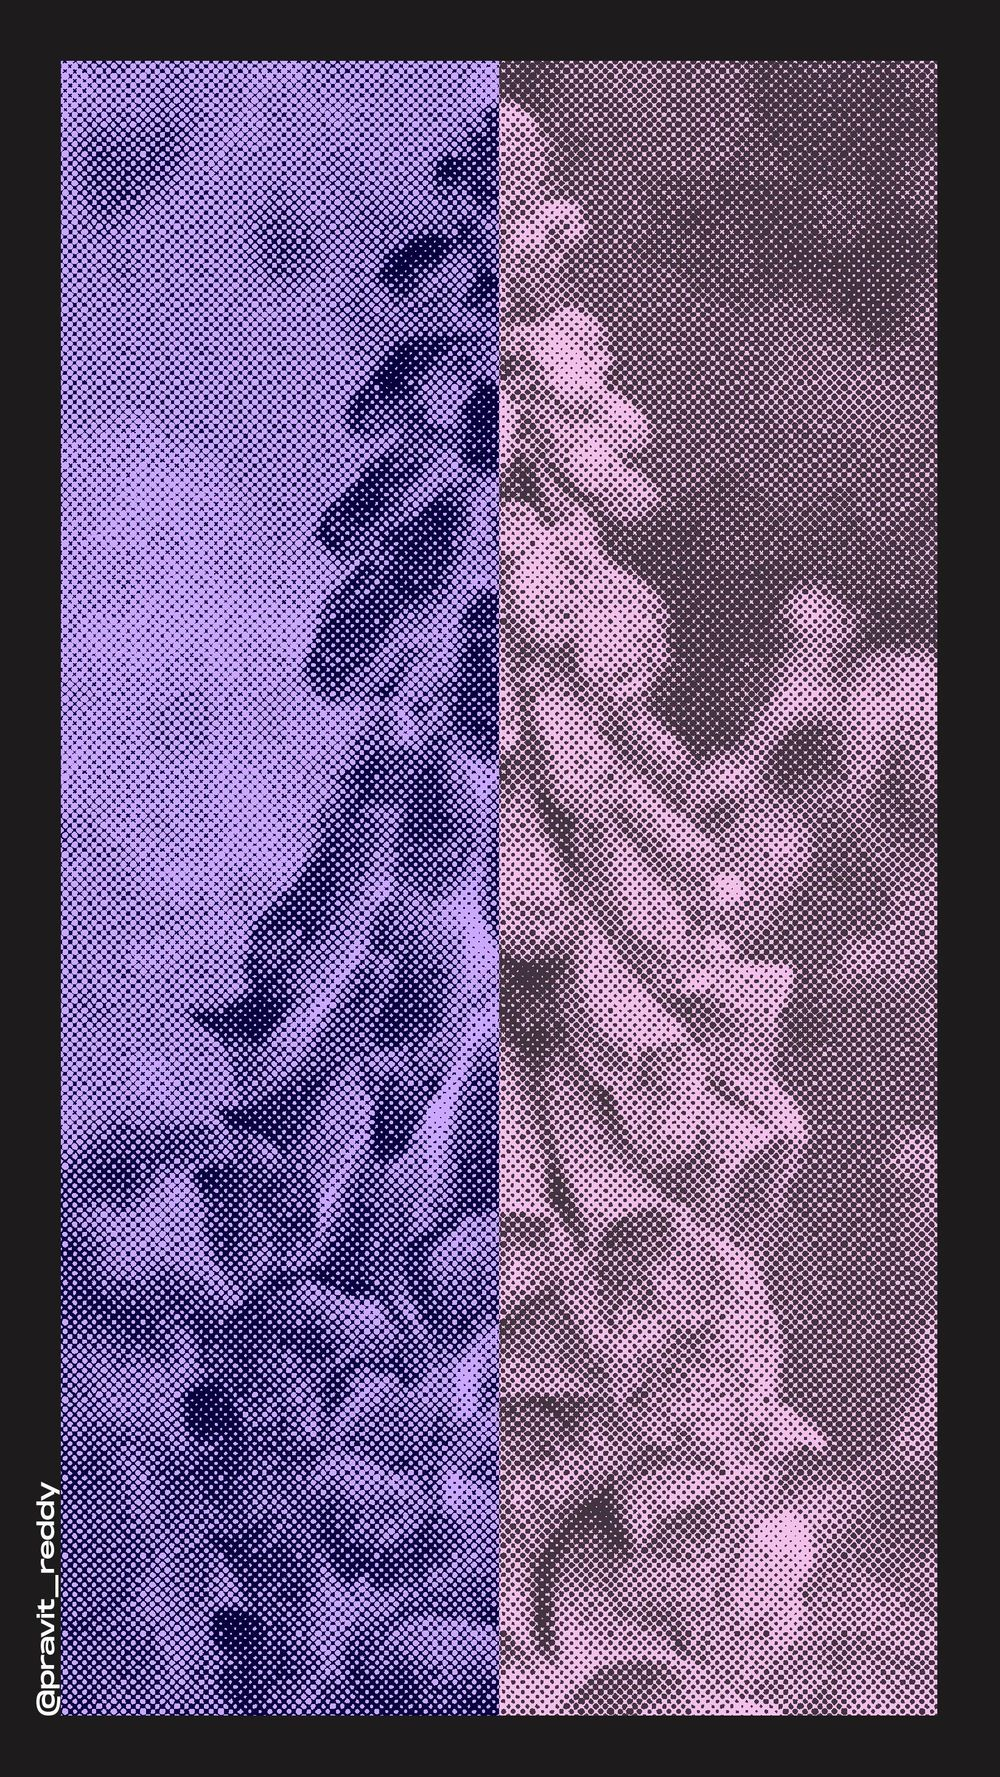 half glove - image 1 - student project